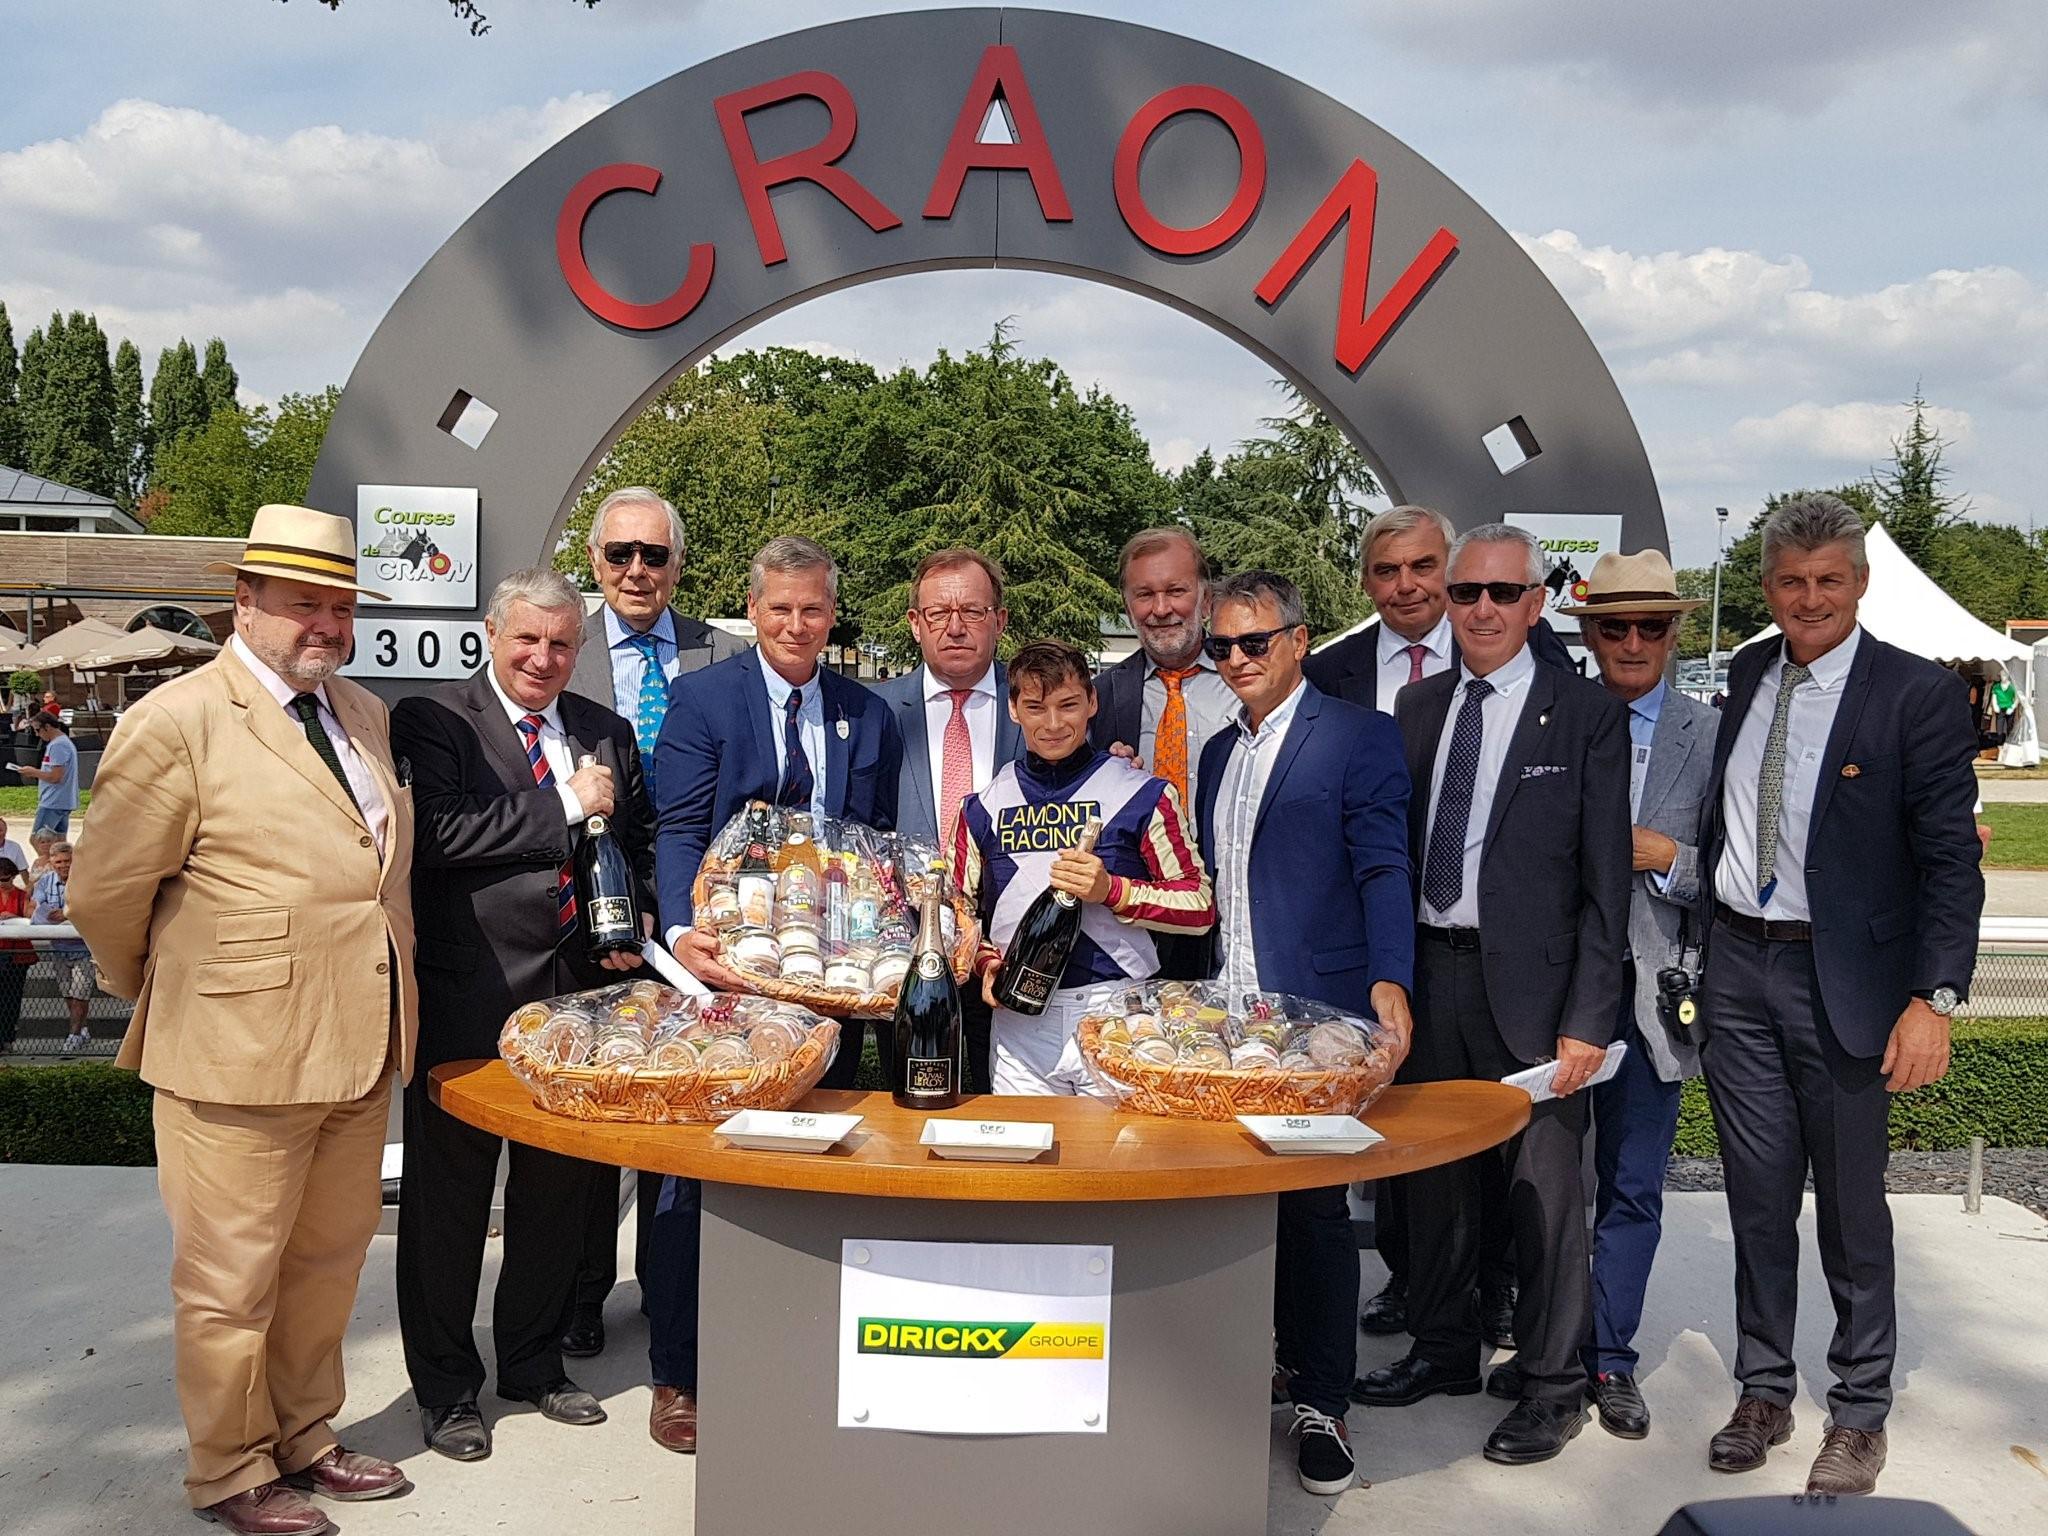 Maifalki winning a Listed Race in Craon France